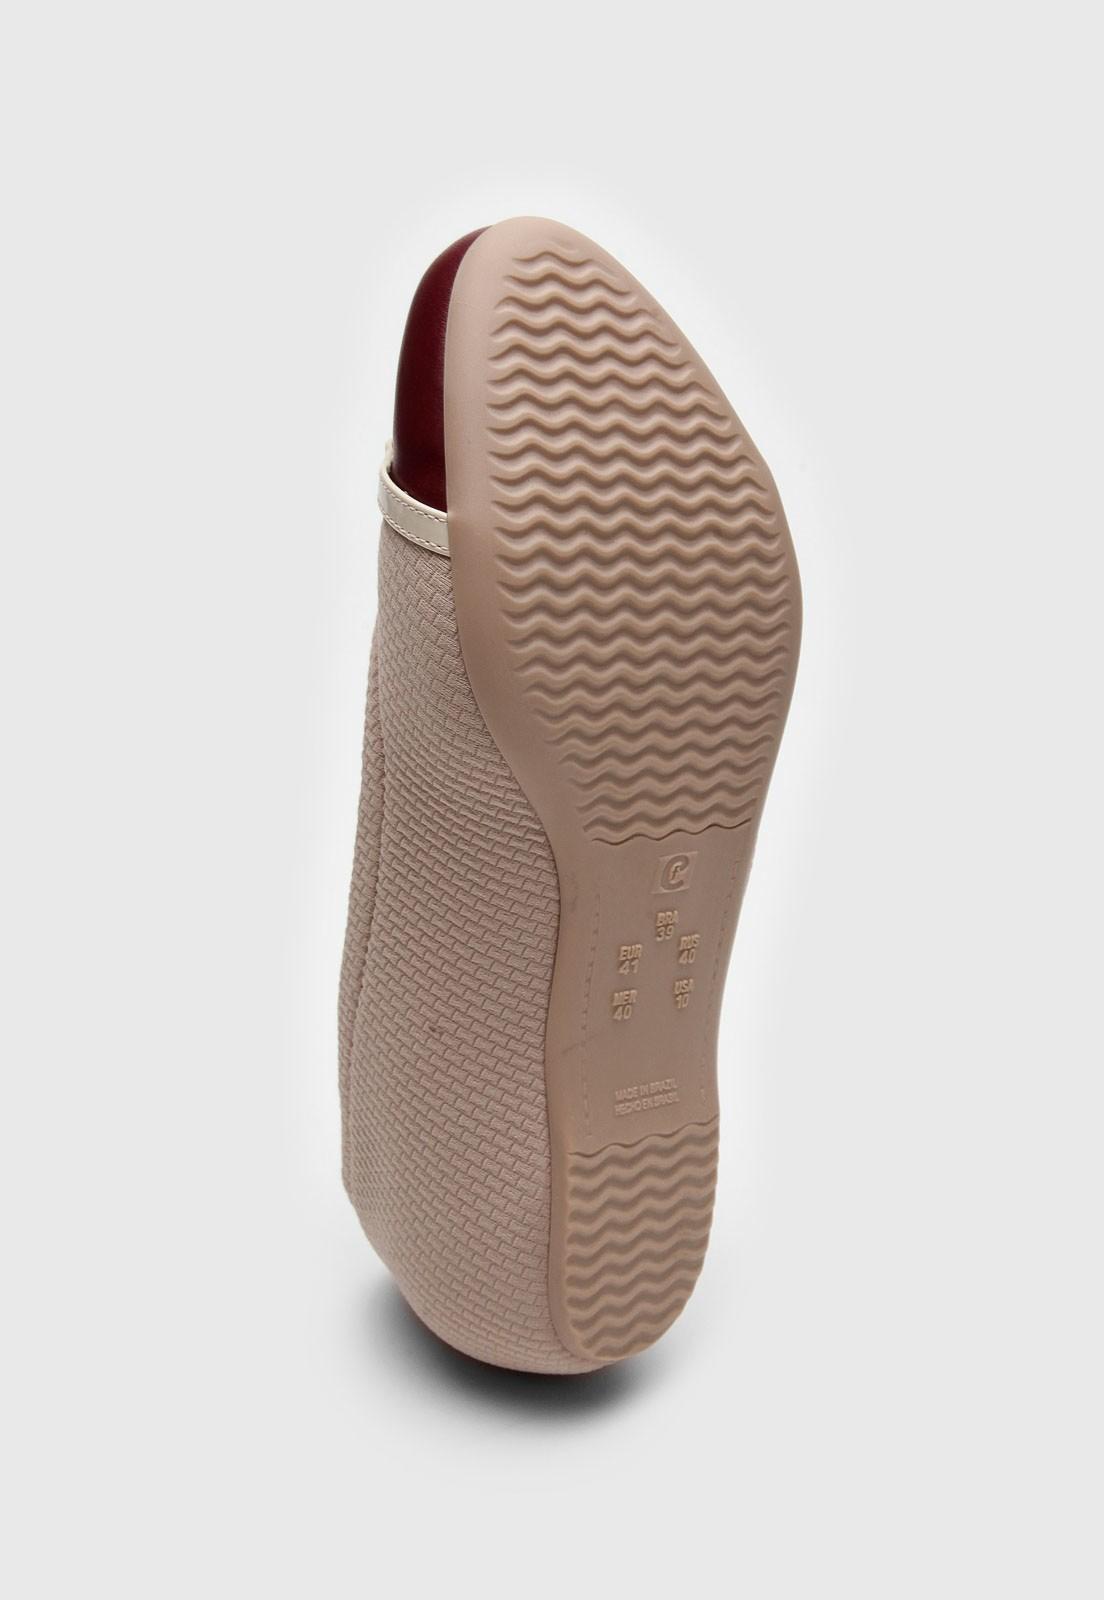 Sapatilha Comfort Flex Nude/Vinho Feminino 2084303